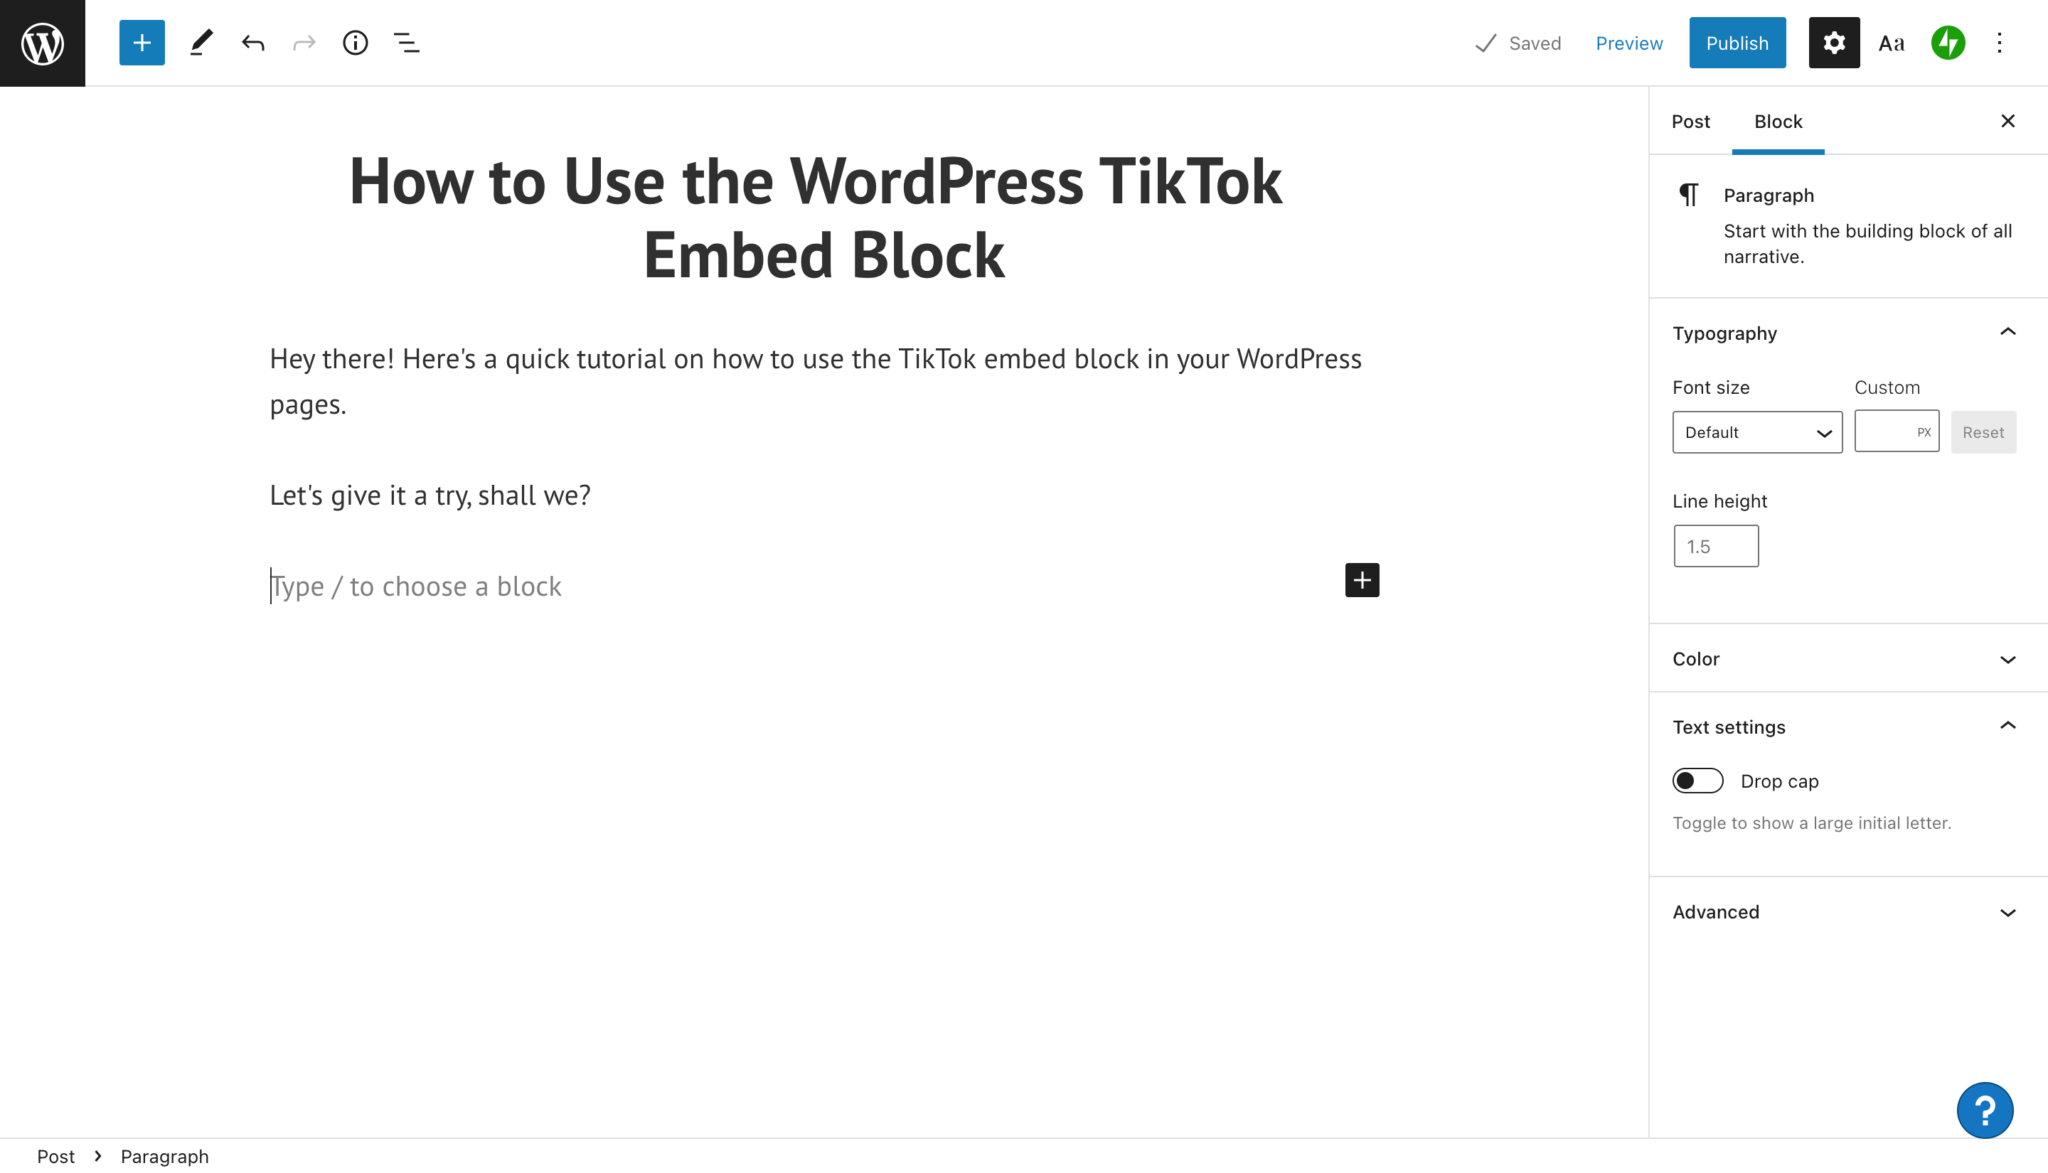 How to Use the WordPress TikTok Embed Block